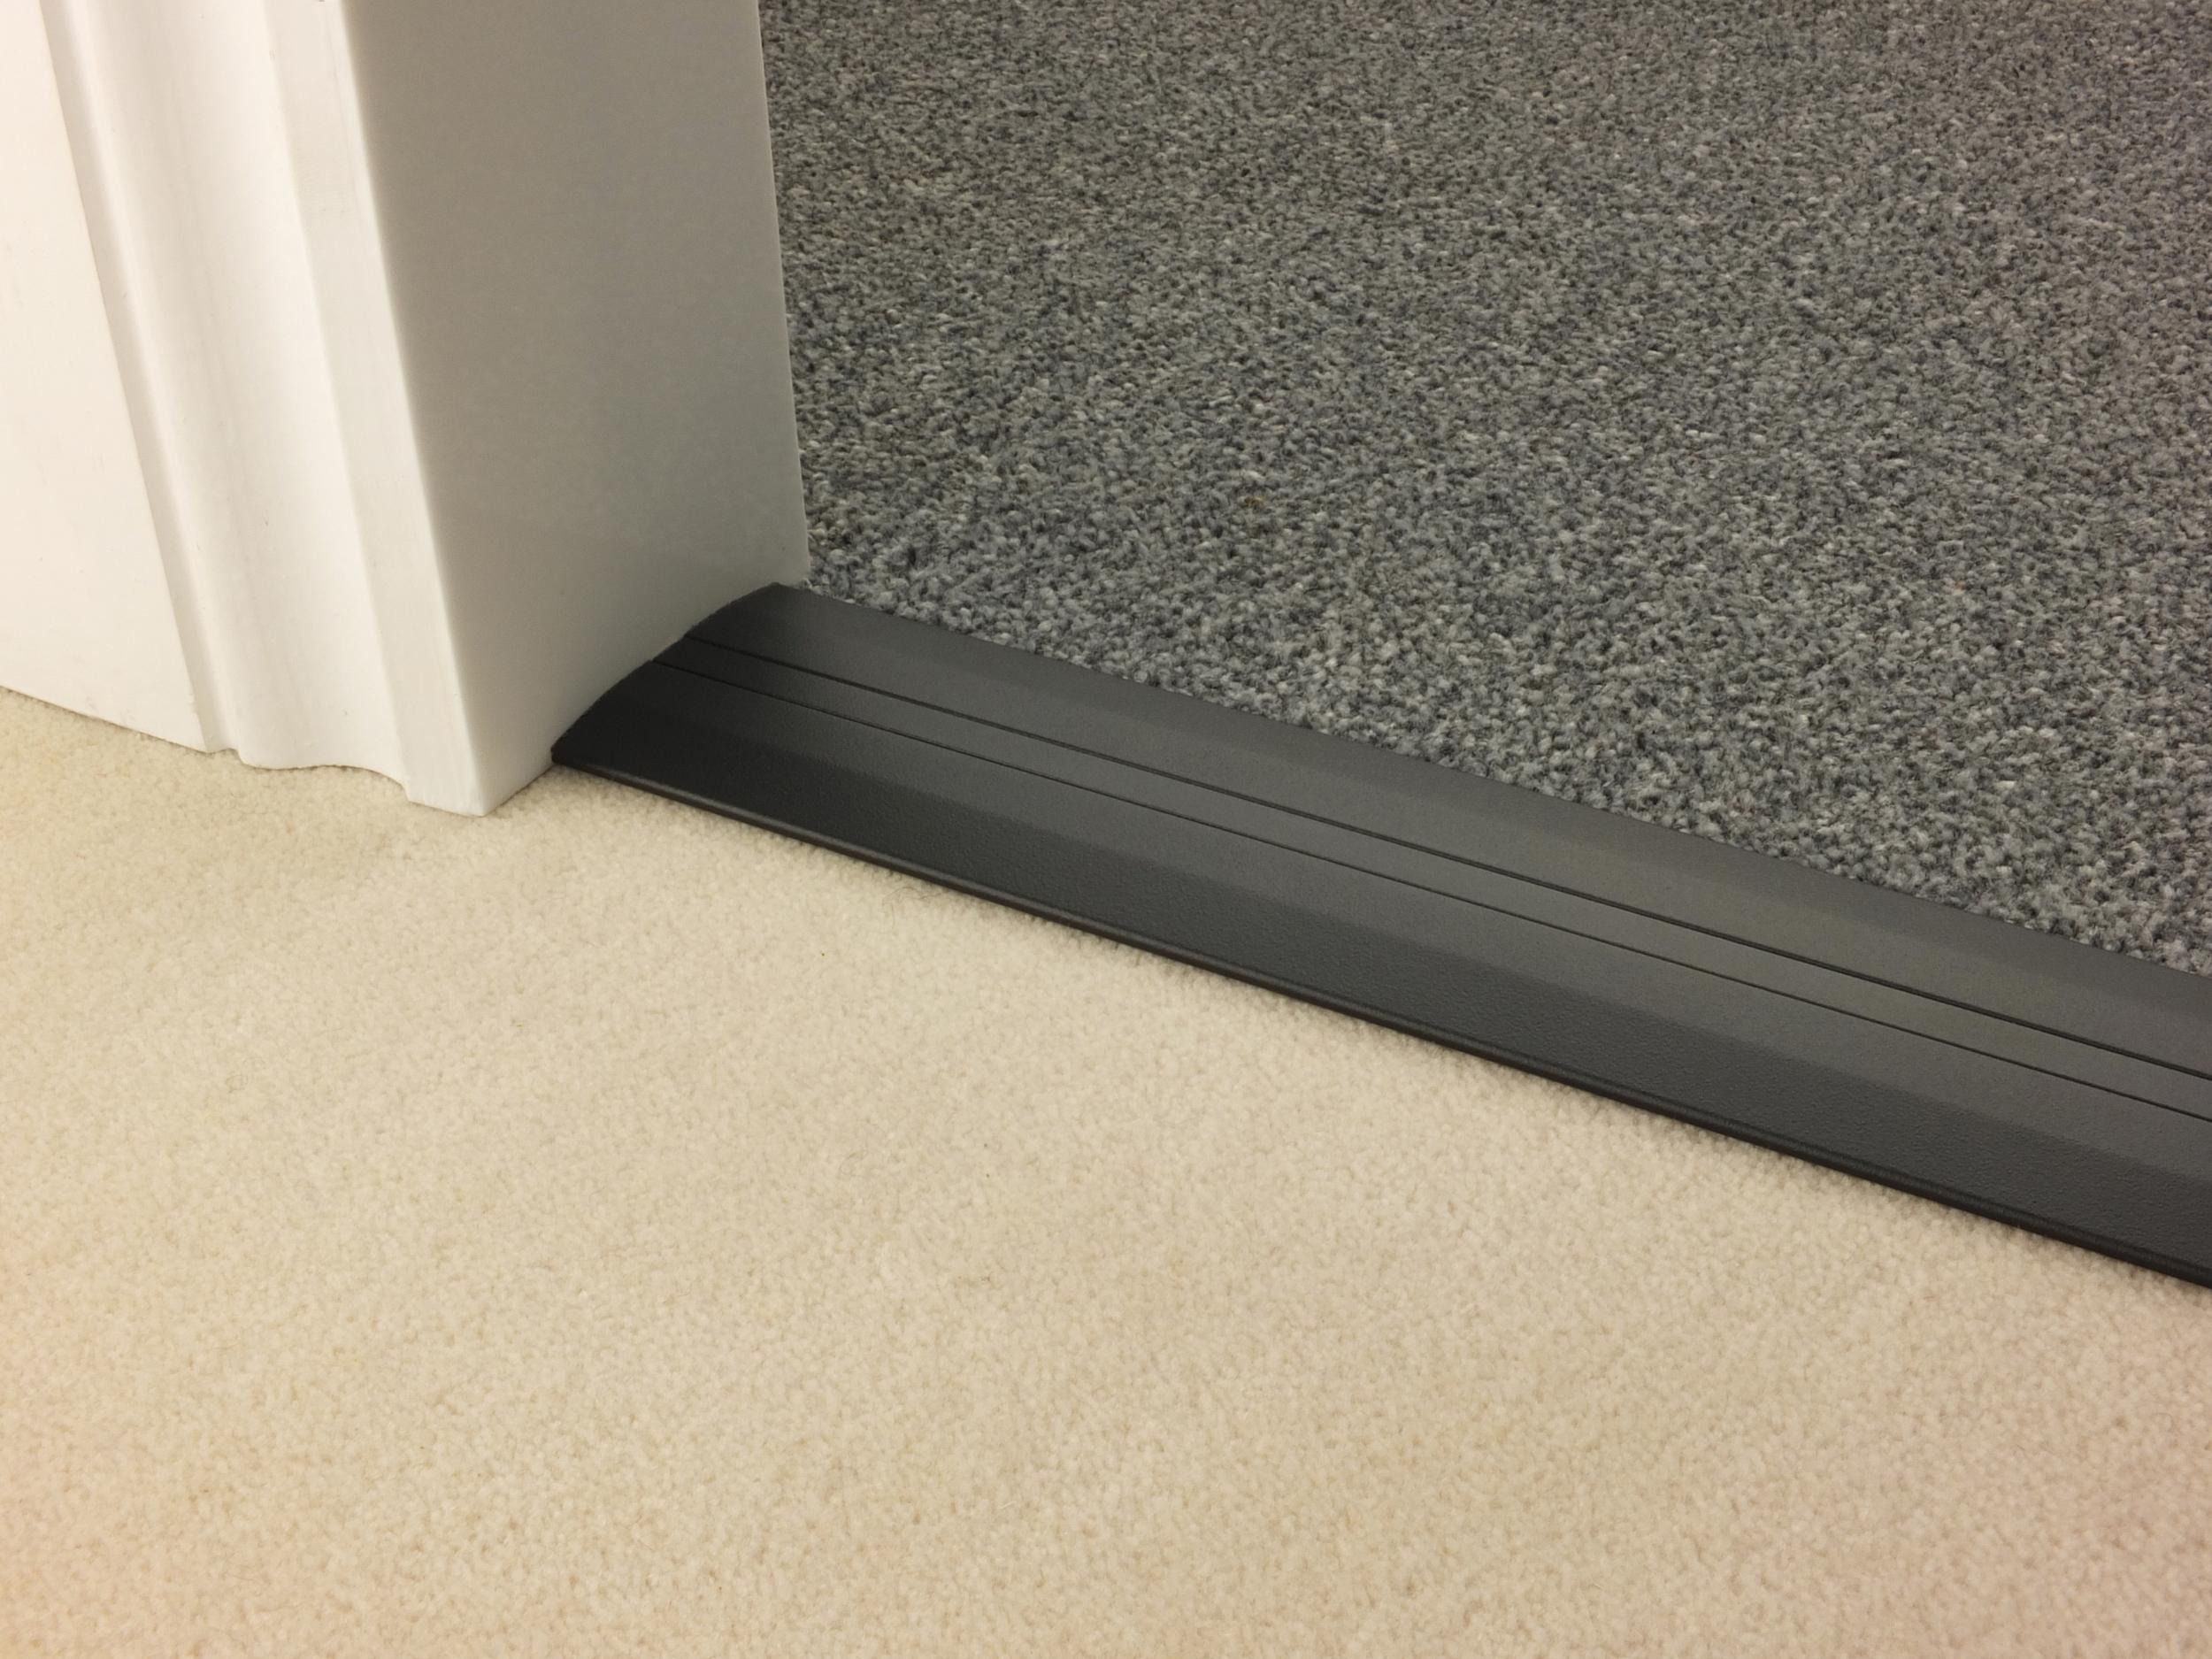 stairrods-doorbar-black-posh55-ctc.jpg